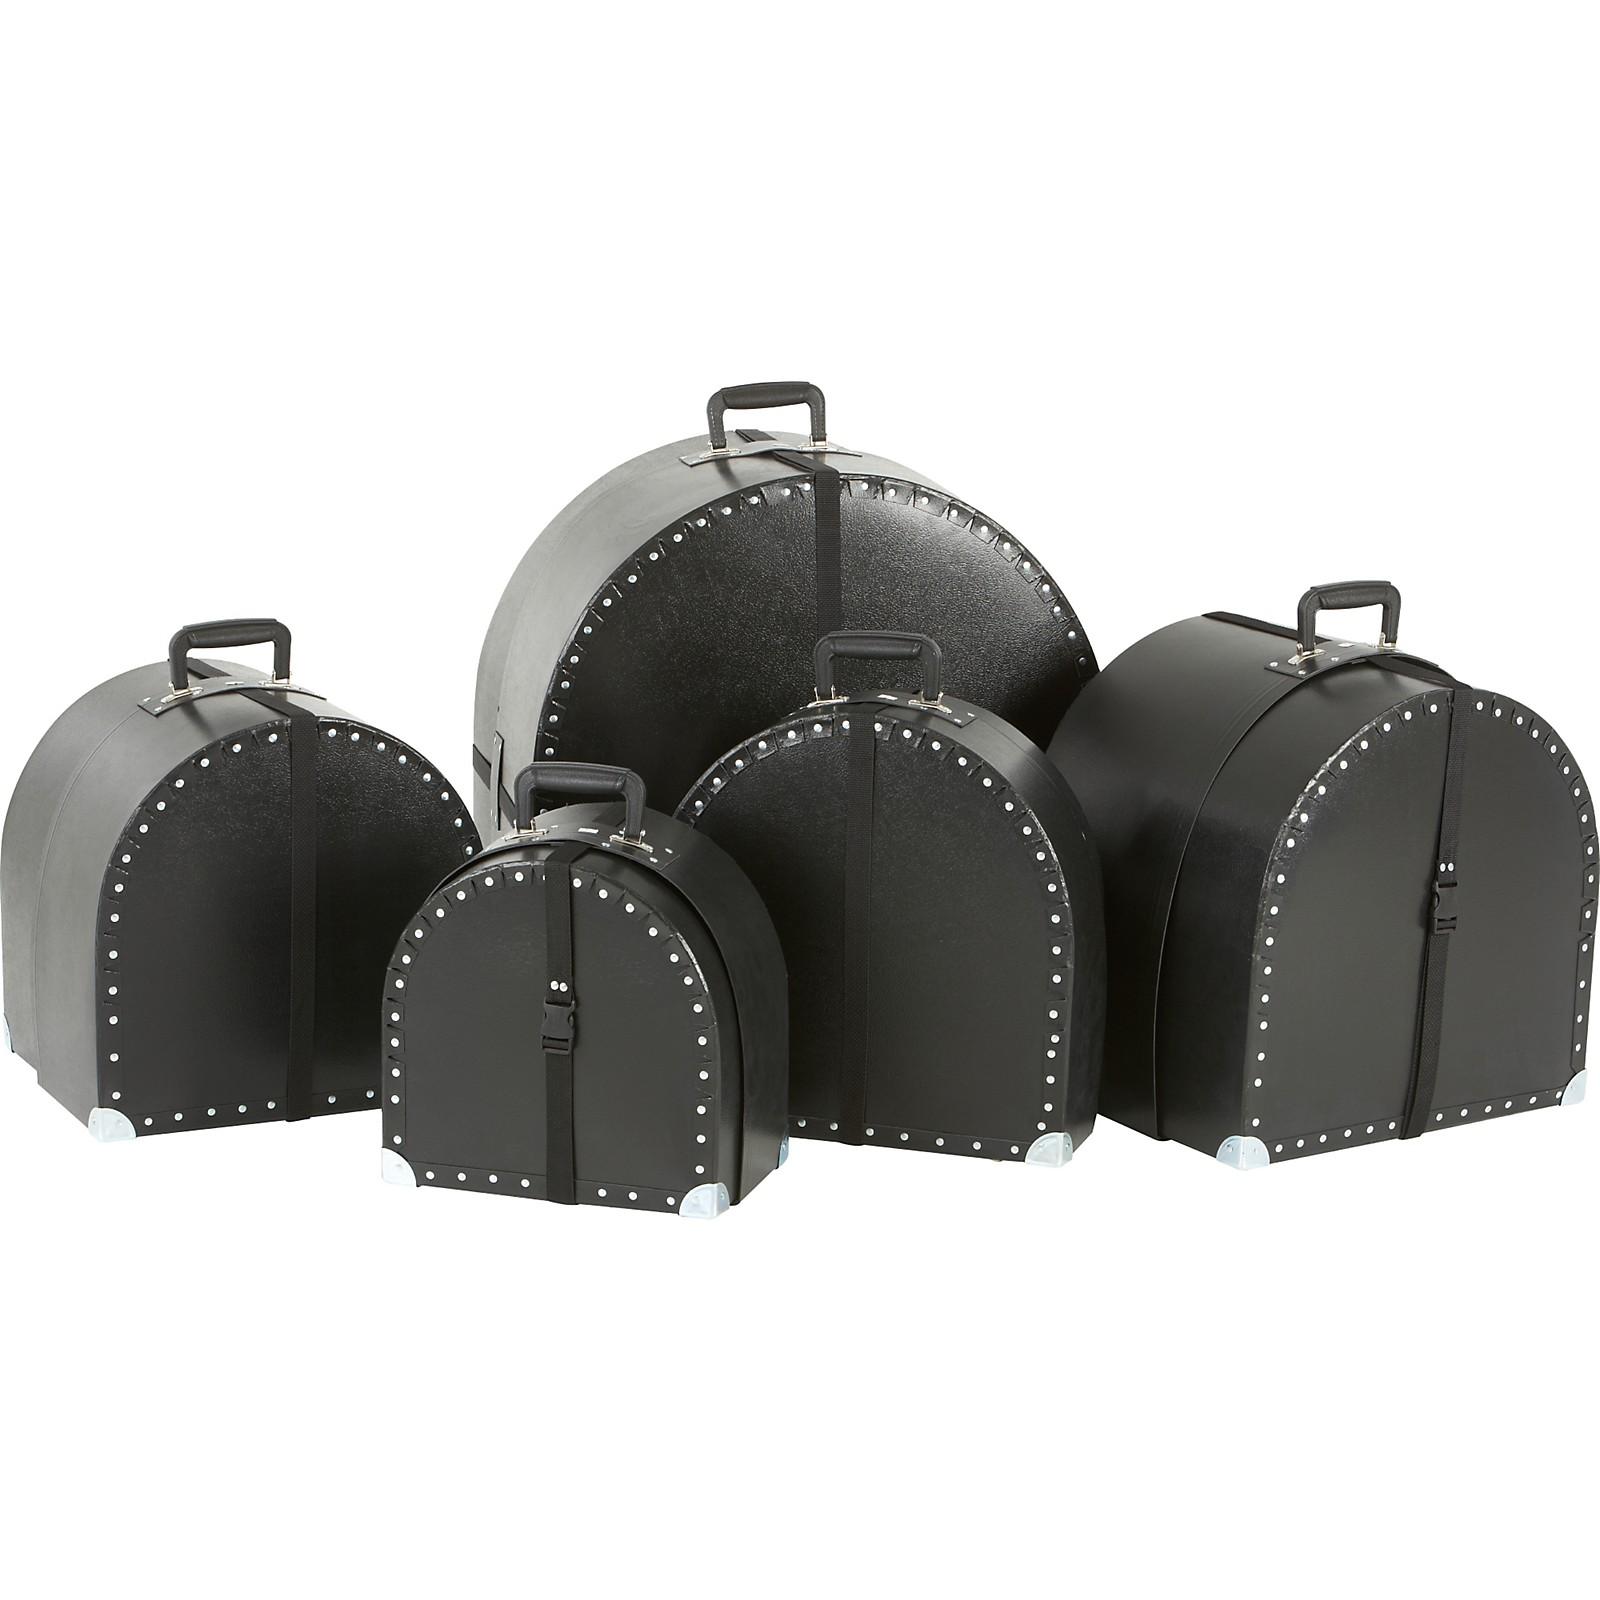 Nomad 5-Piece ZEP 22 Drum Case Set